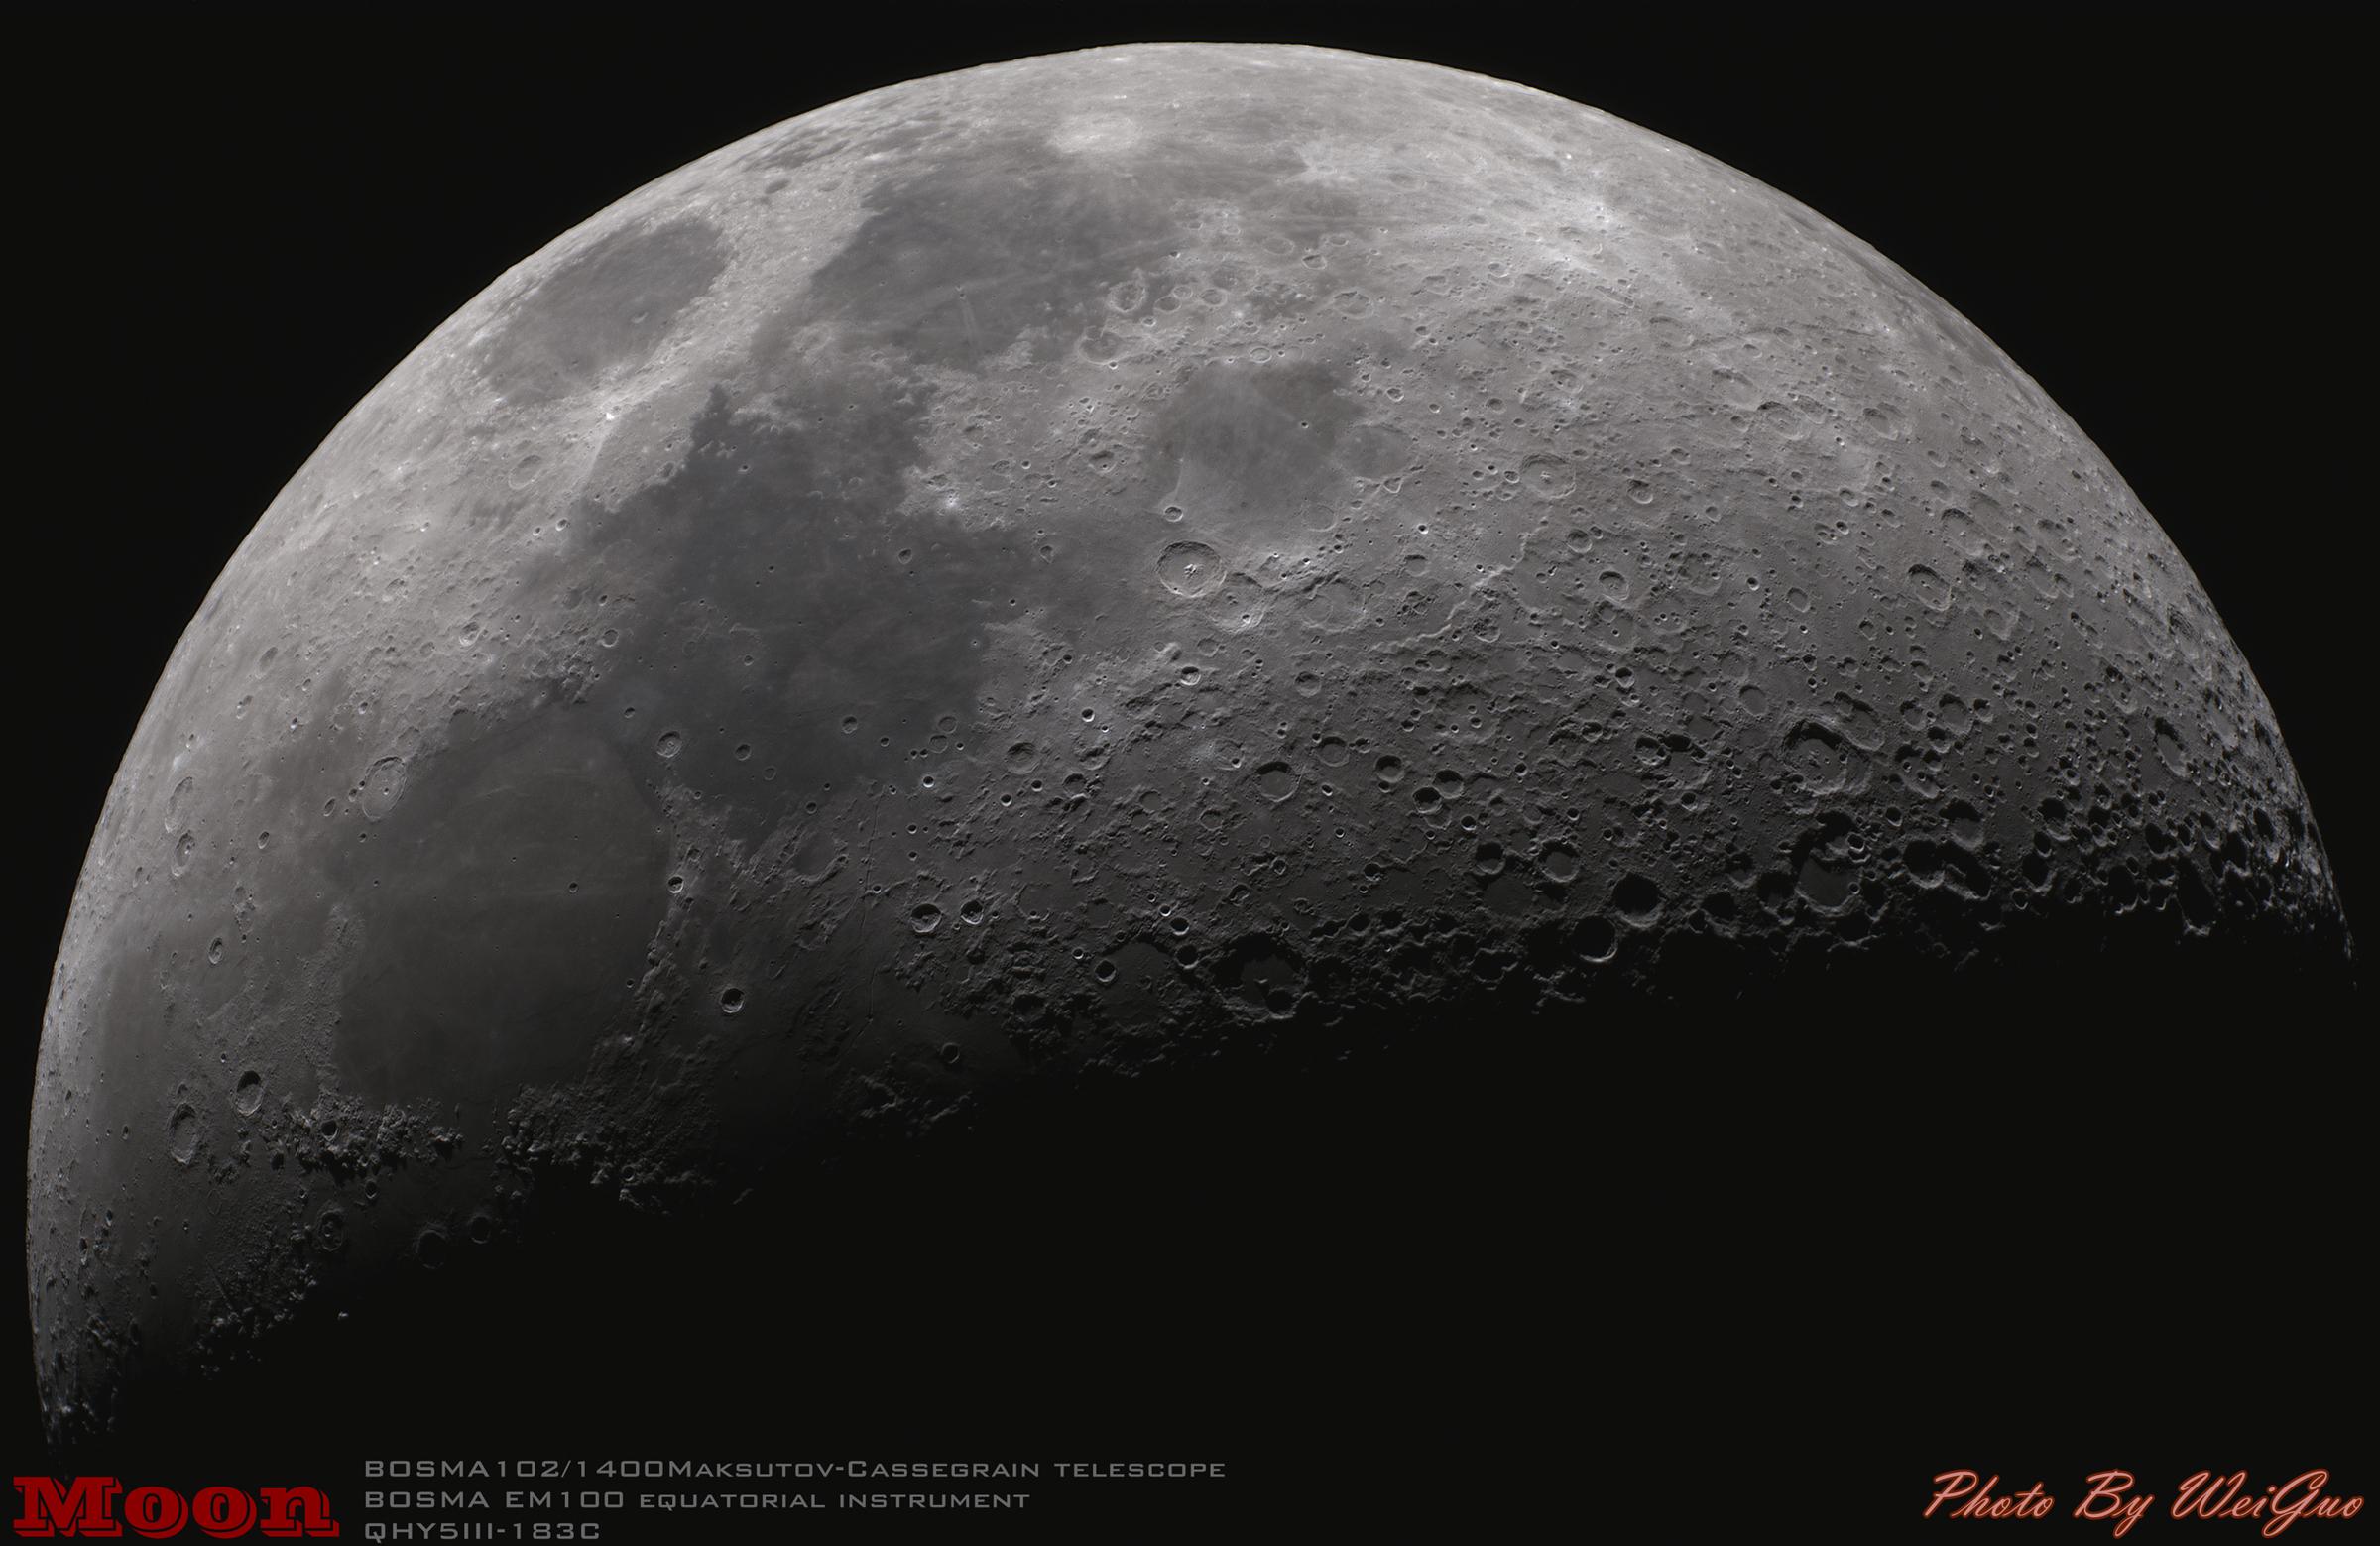 2021-06-17-1310_8-RGB-Moon_pipp_g4_ap315_副本x.jpg